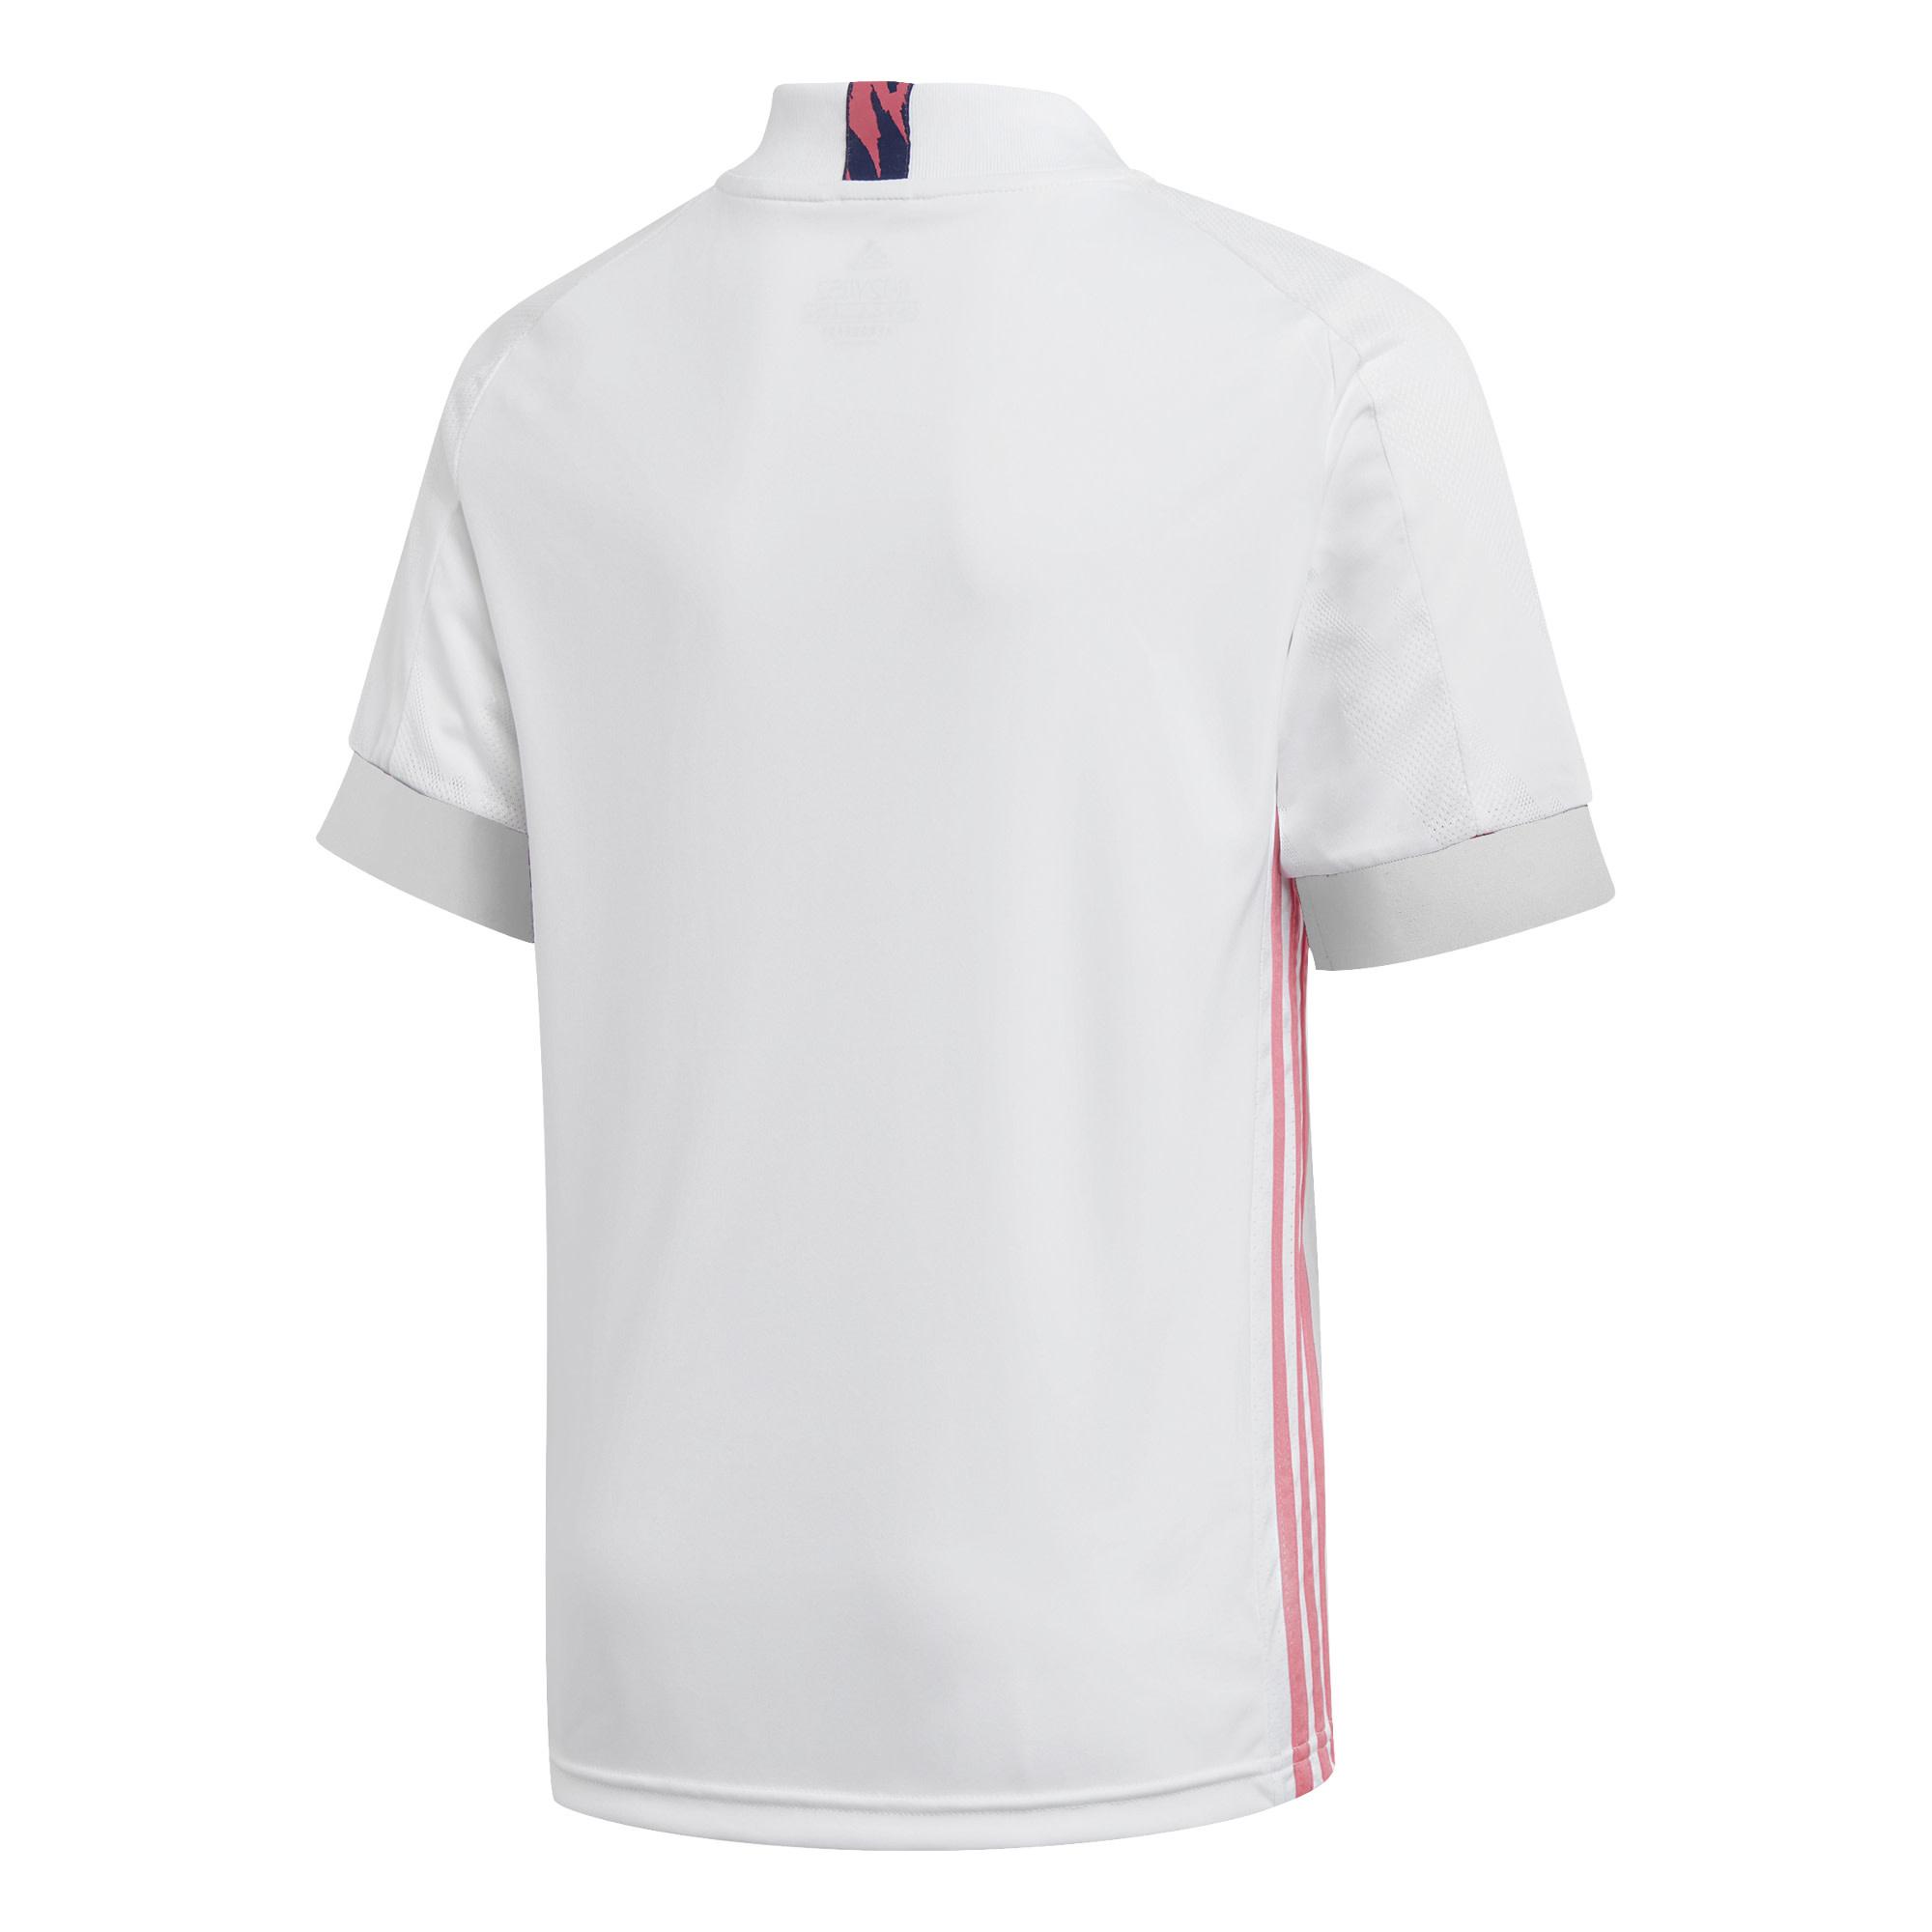 Adidas ADIDAS JR Real Madrid Home Jersey '20-'21